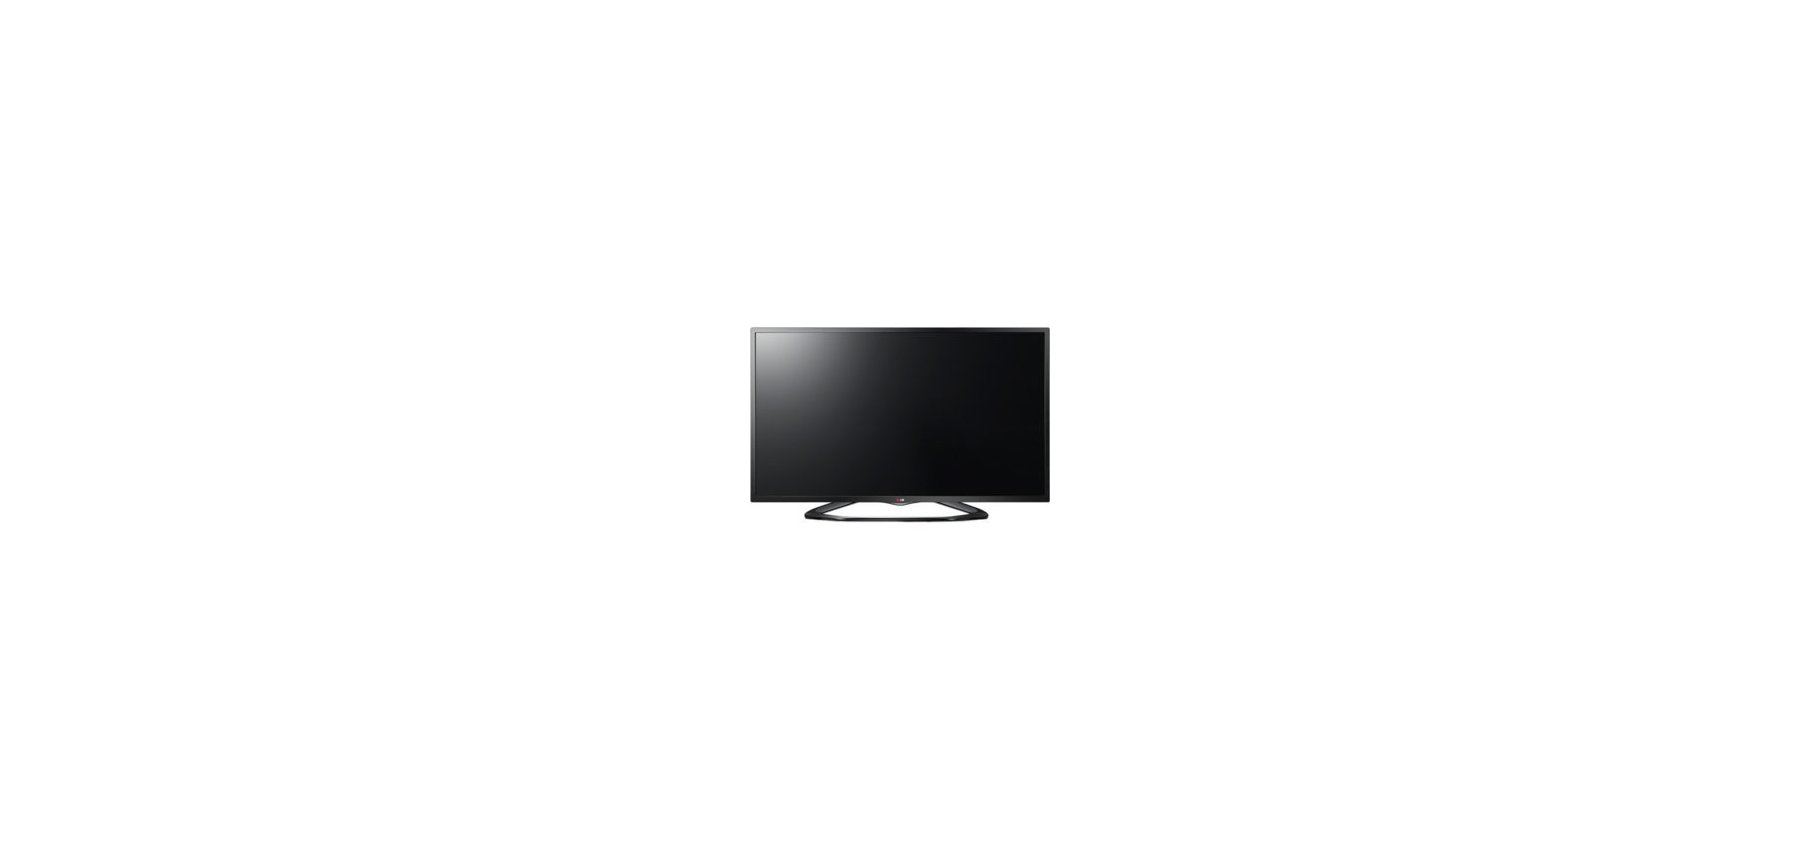 Telewizor LG 47LN575S/47Cali/SMART TV/Full HD 1920 x 1080